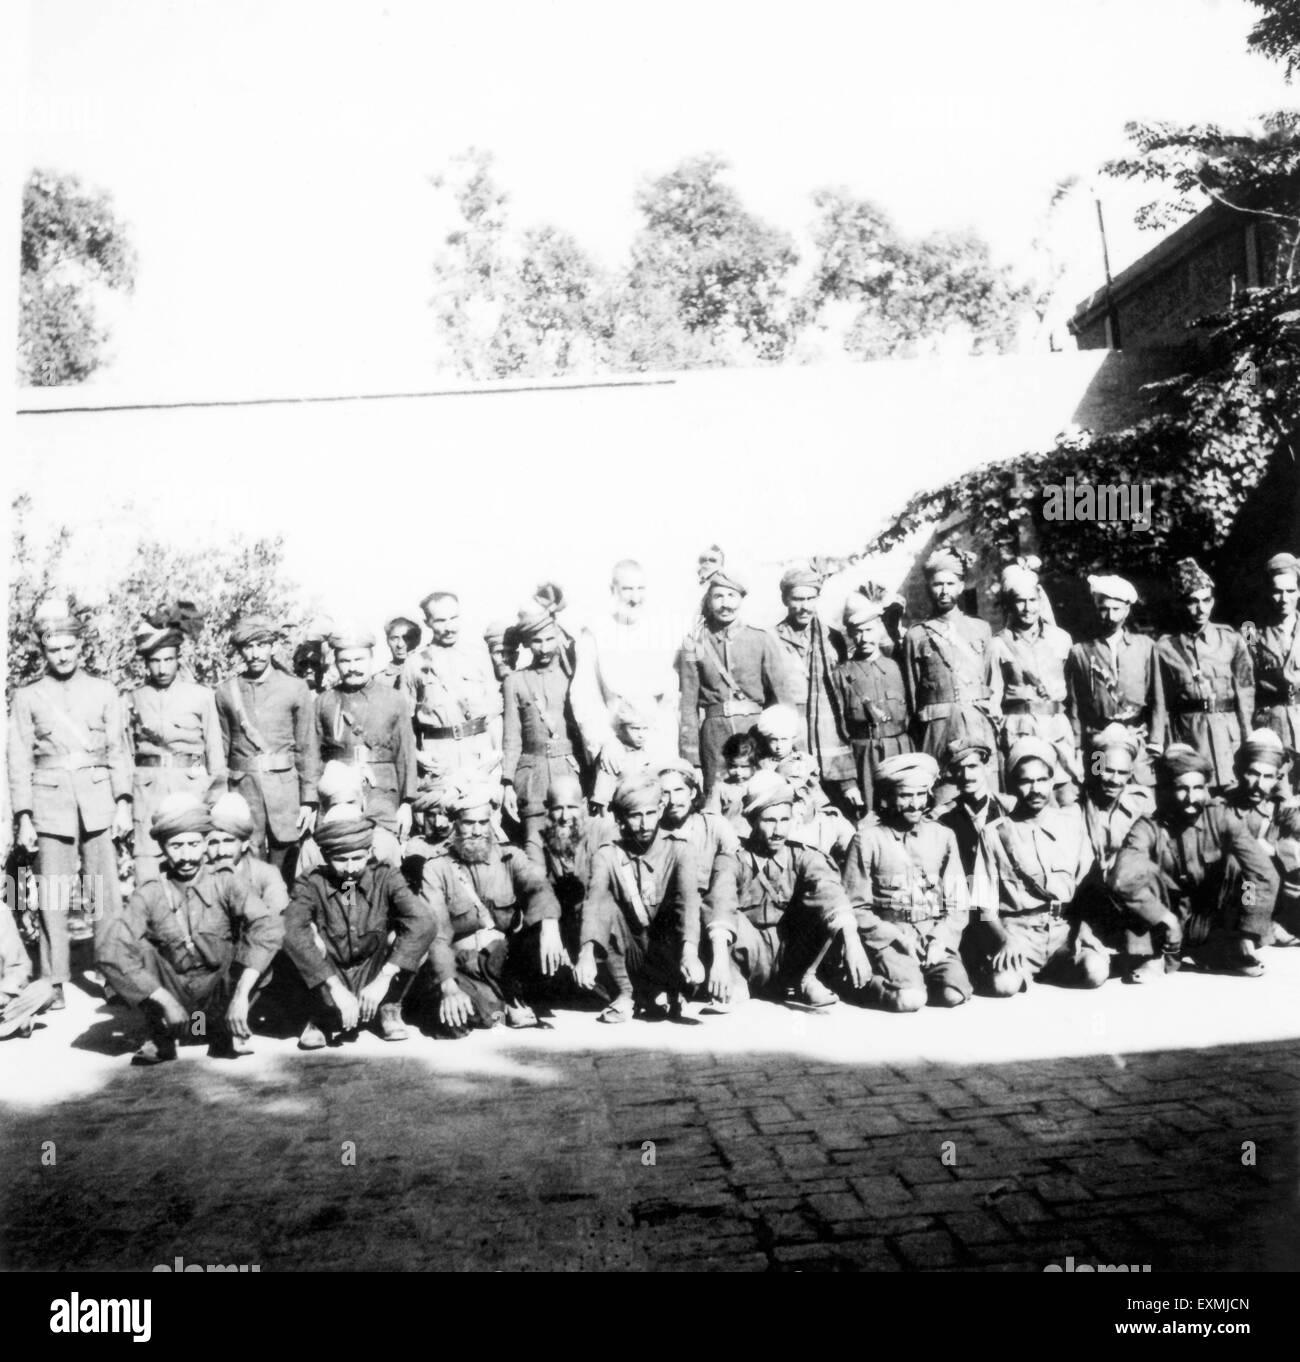 Khan Abdul Gaffar Khan midst nonviolent army founded occasion of Mahatma Gandhi visit Peshawar North West Frontier - Stock Image